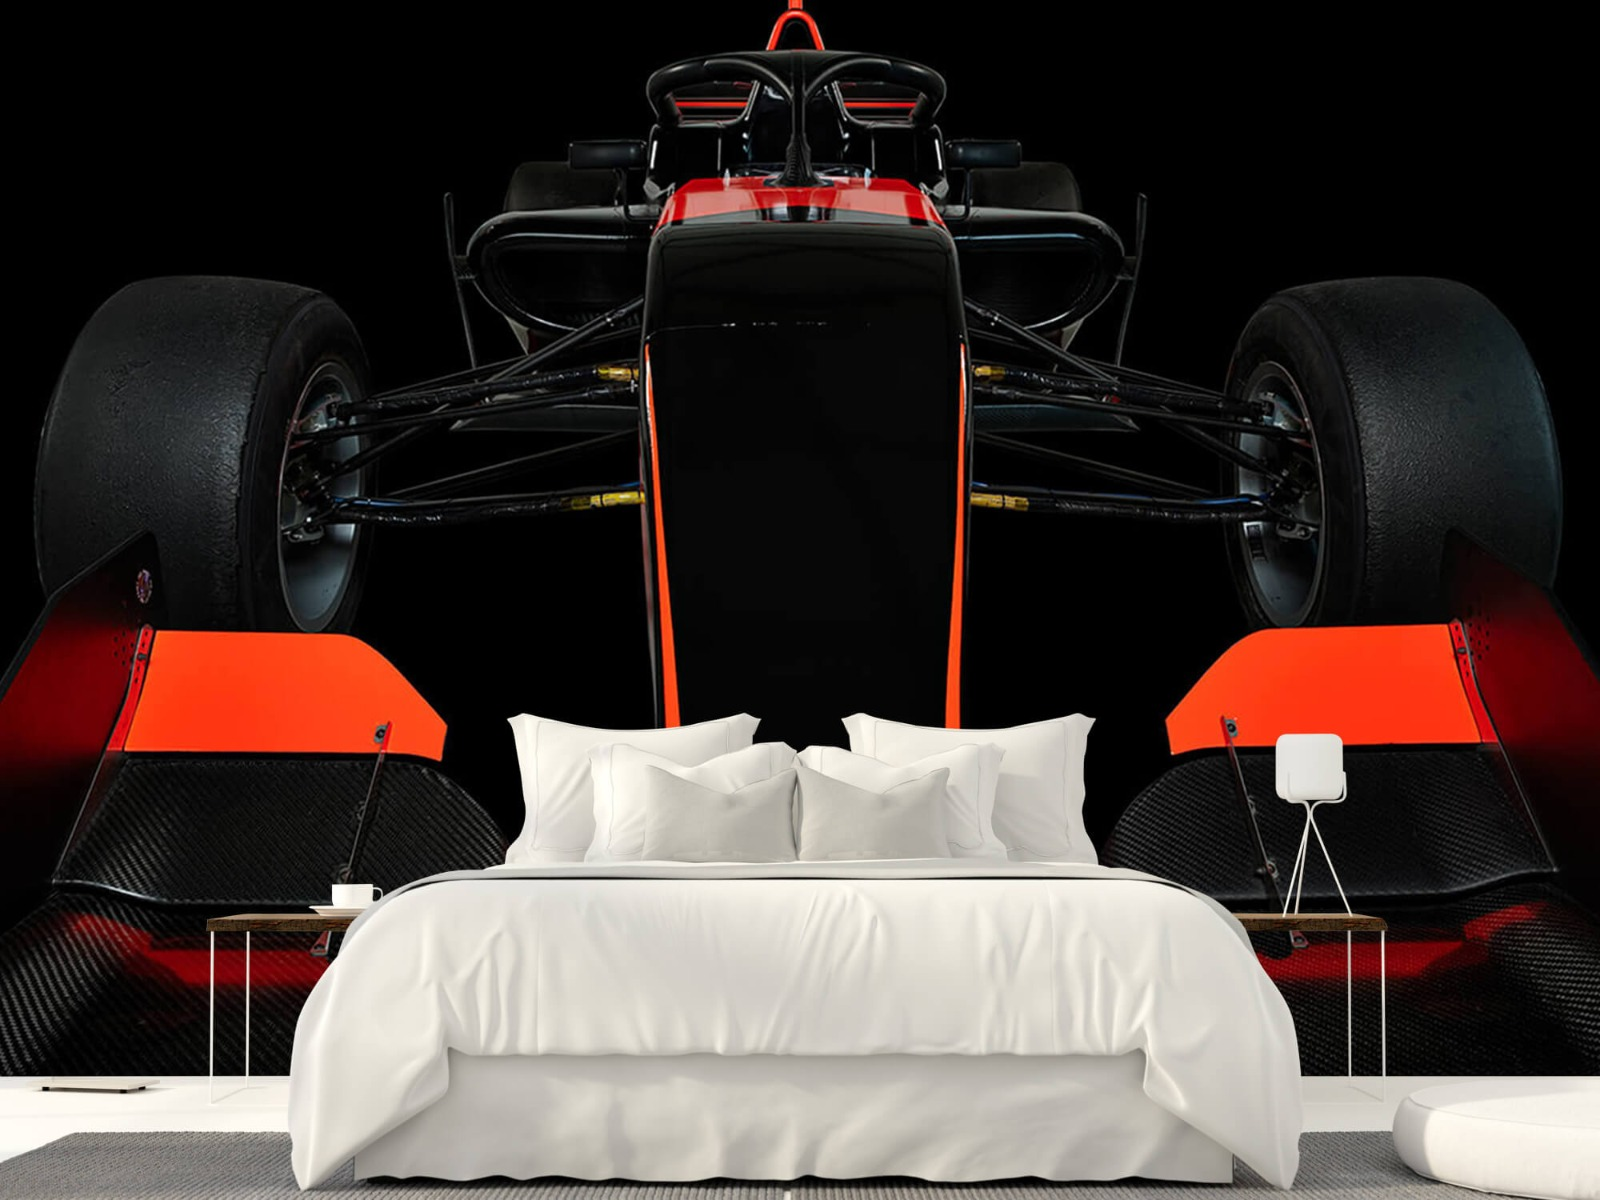 Sportauto's - Formule 3 - Lower front view - dark - Slaapkamer 23